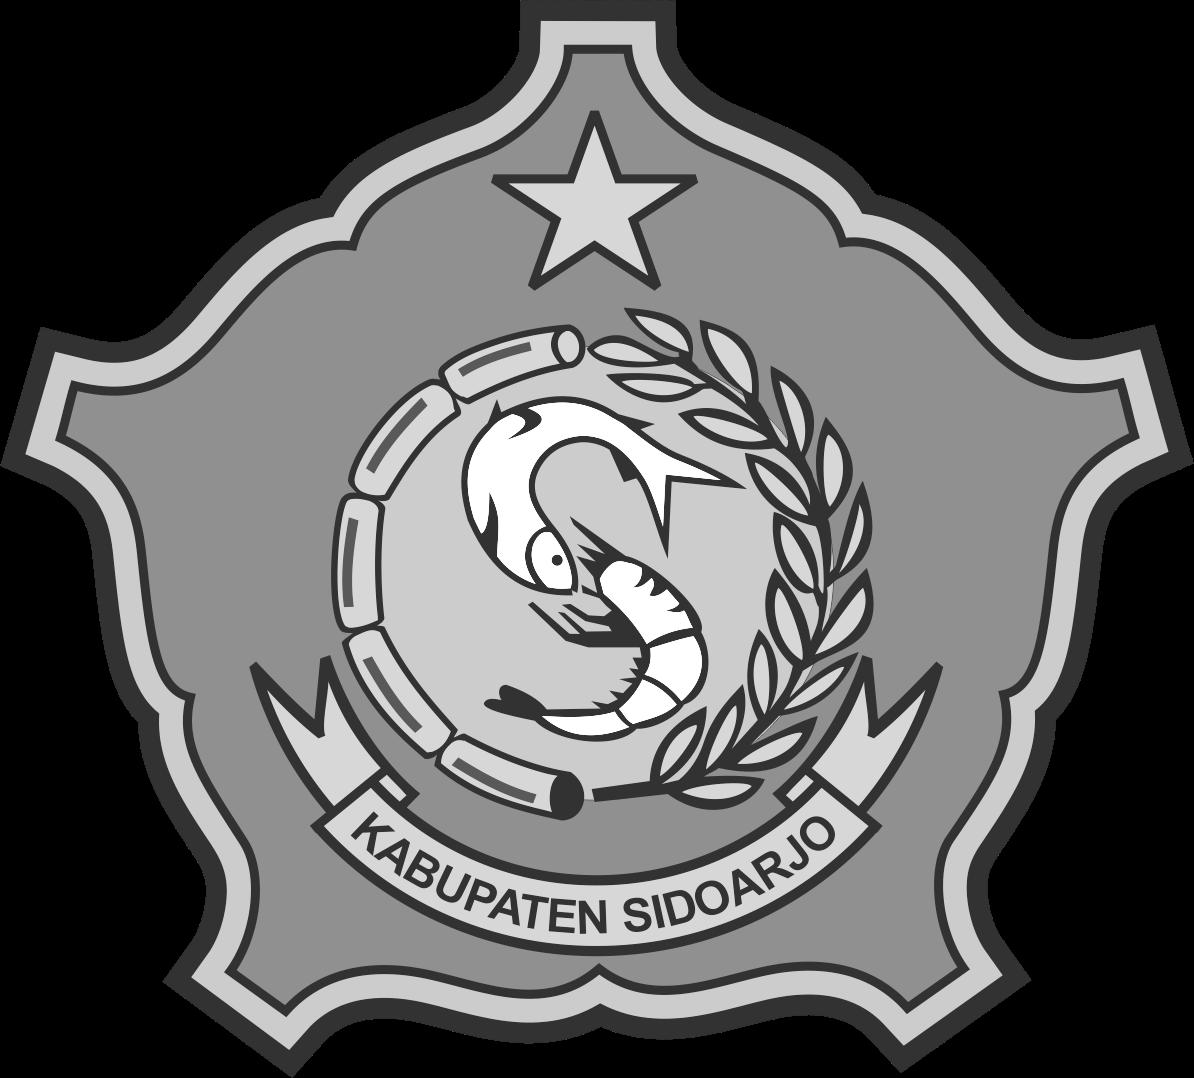 Logo Kabupaten Sidoarjo Jawa Timur